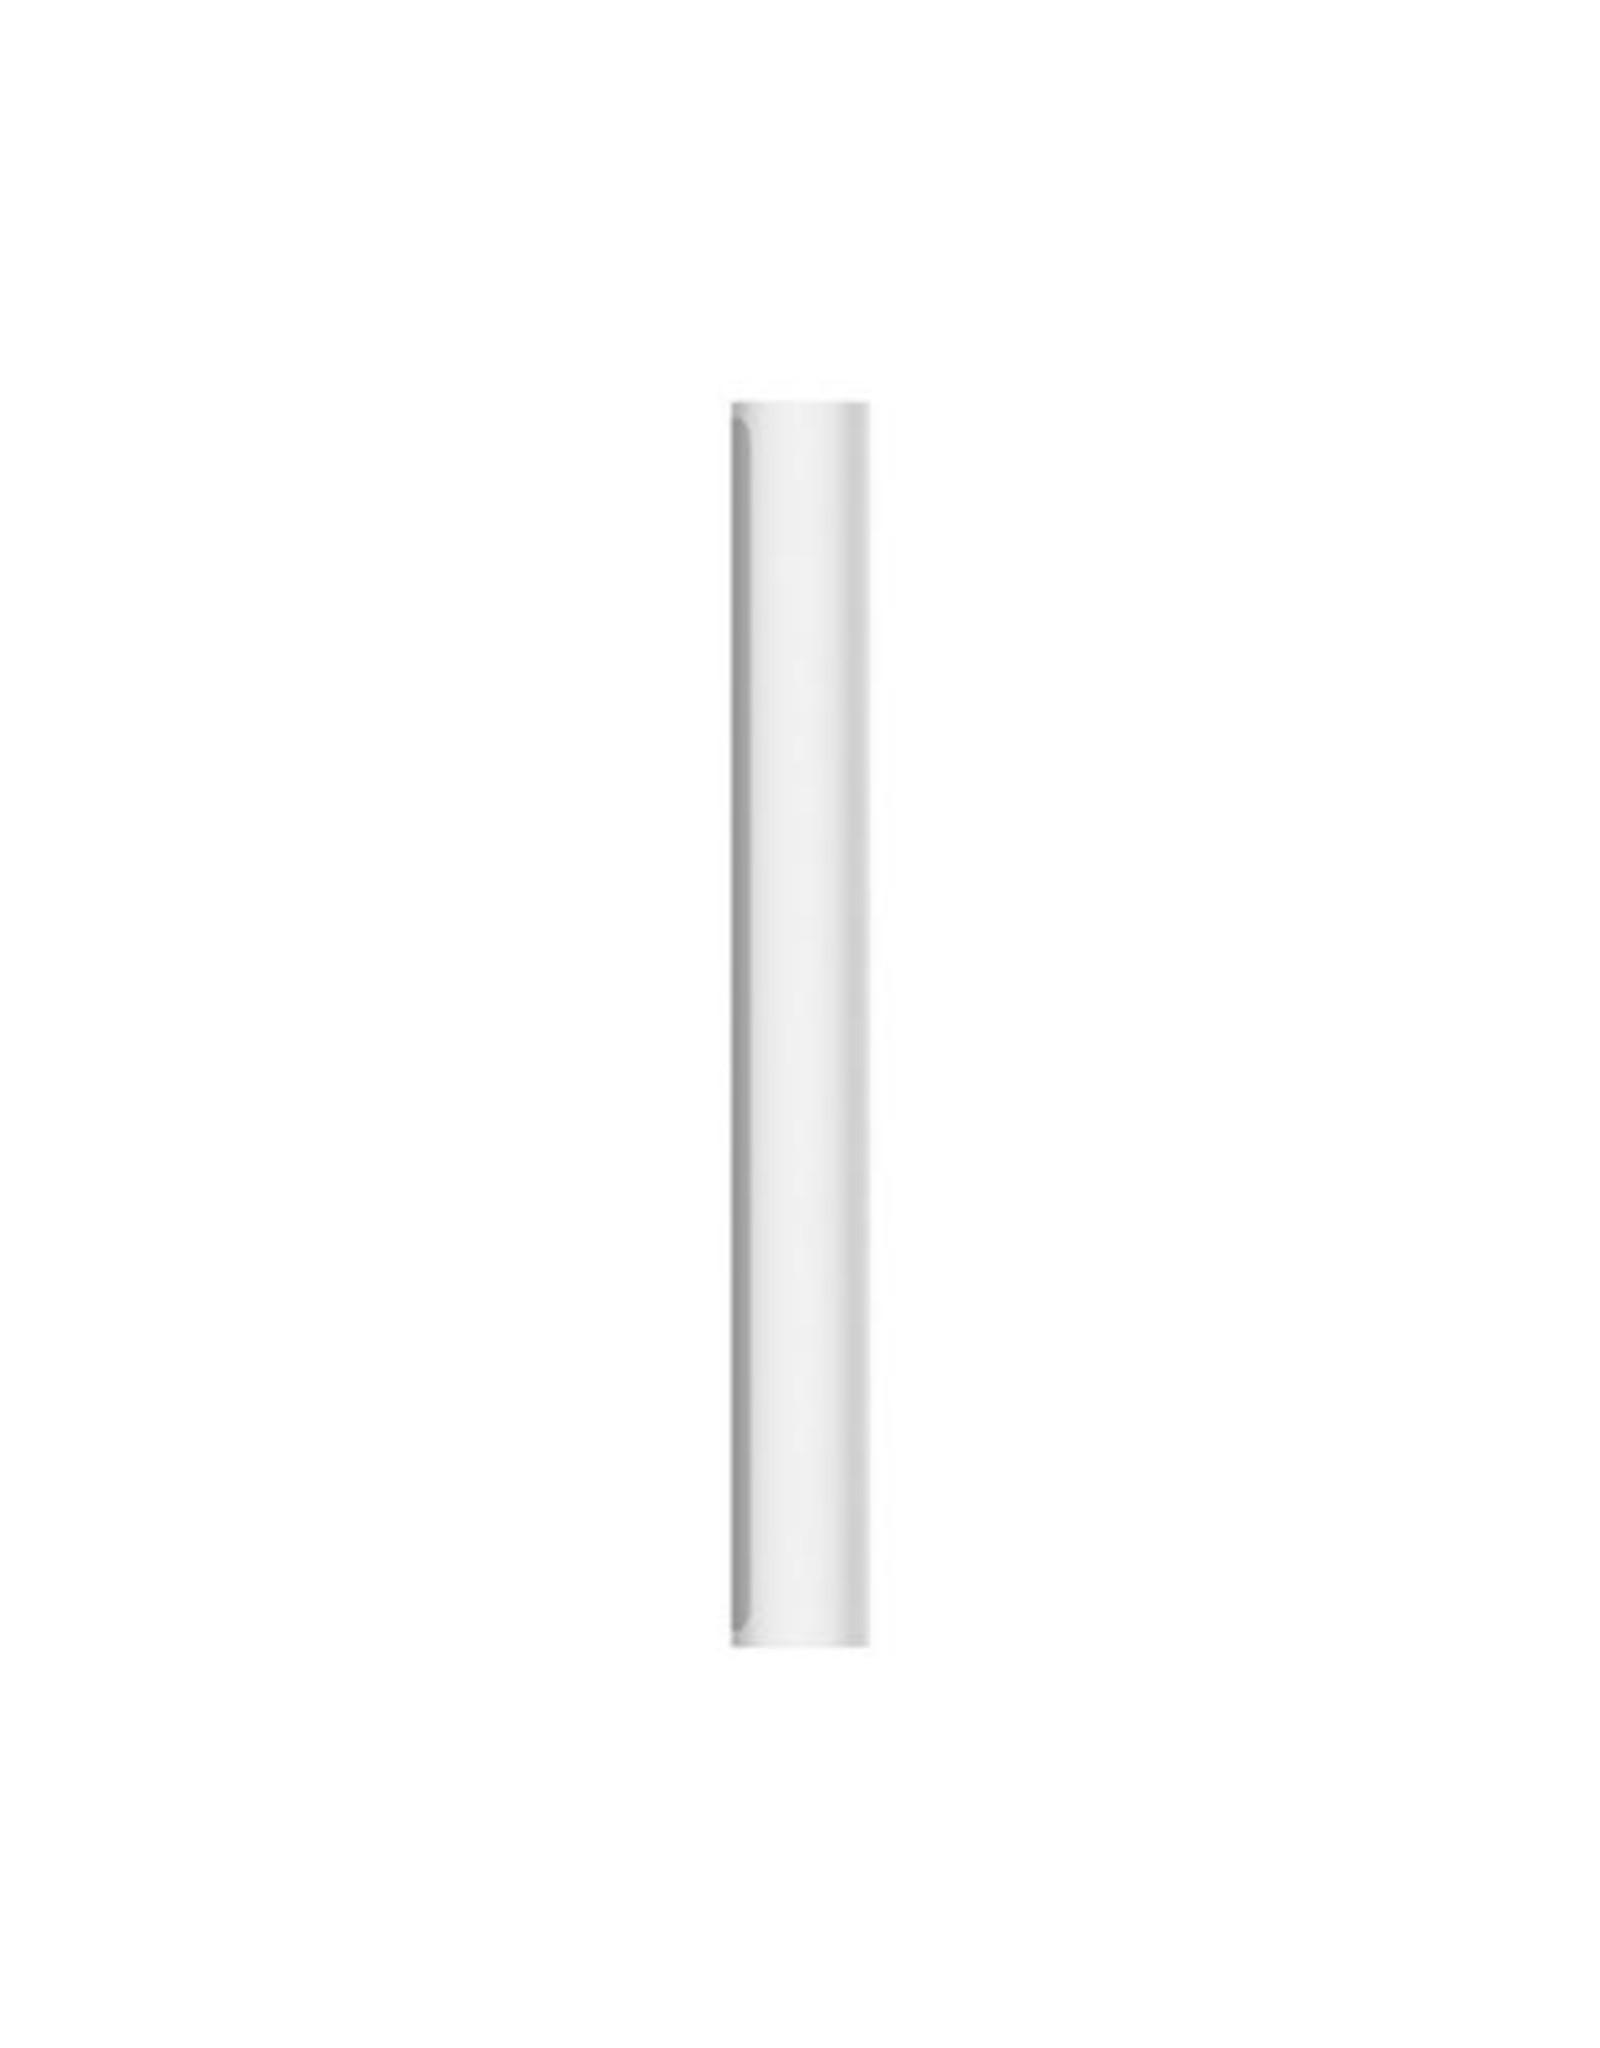 Xiaomi 10000mAh Mi Wireless Power Bank Essential (White)